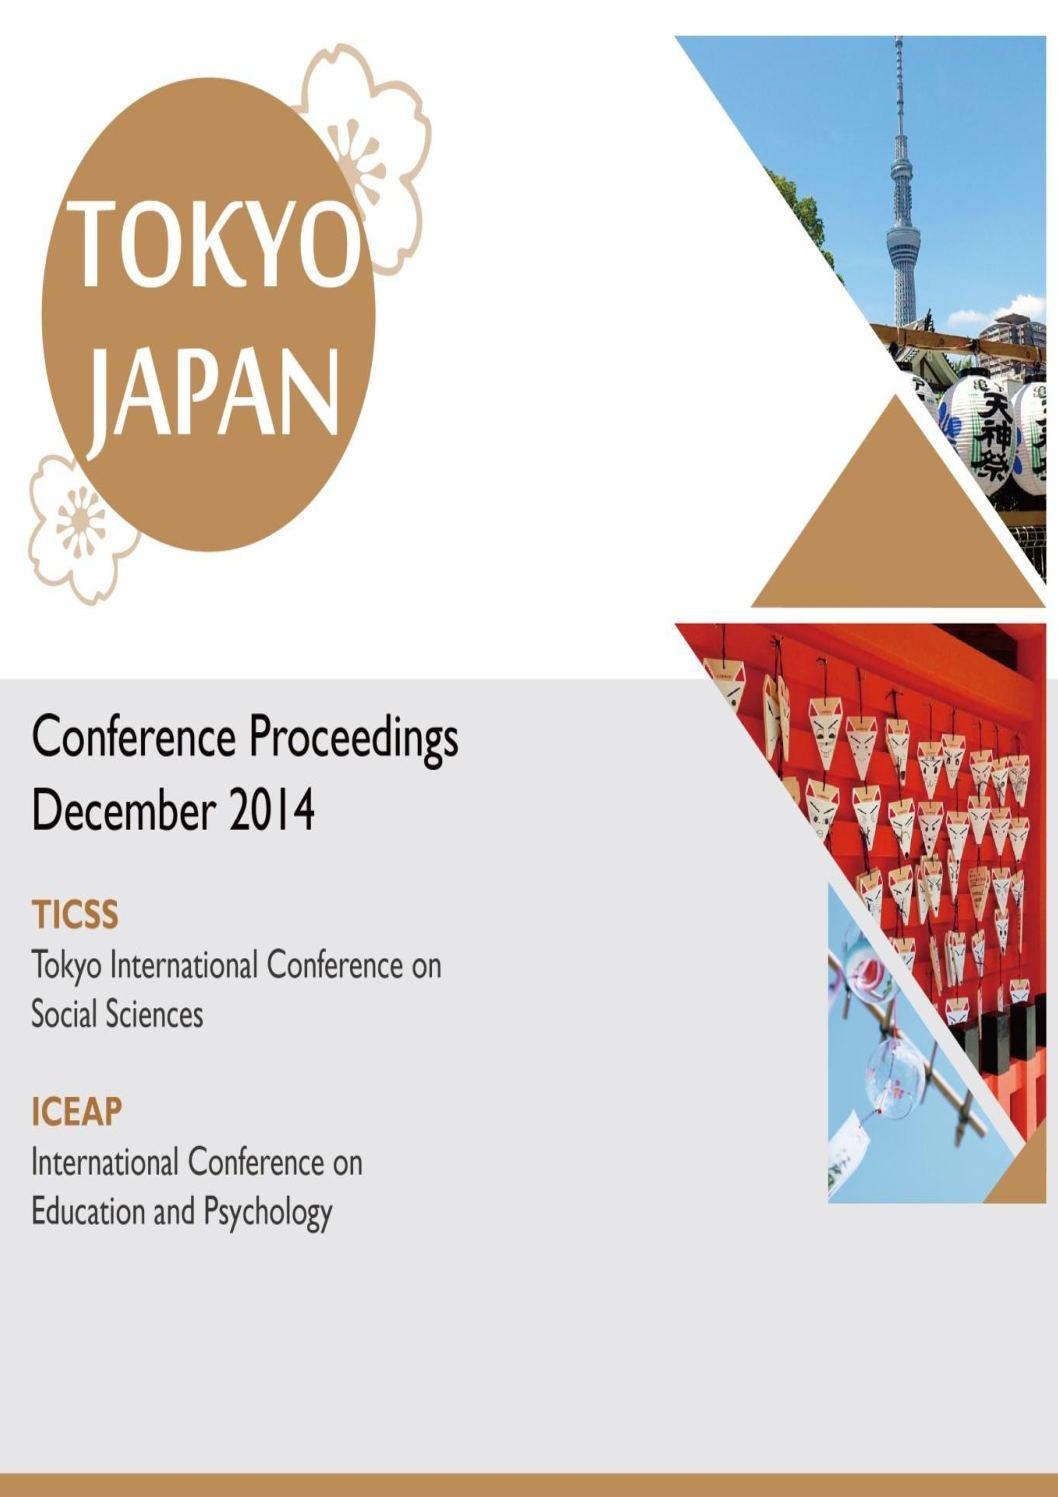 Calamo 51 201412 Tokyo Conference Proceedings Ticssiceap Split 1 Micro Usb Wiring Diagram 19 Emprendedor